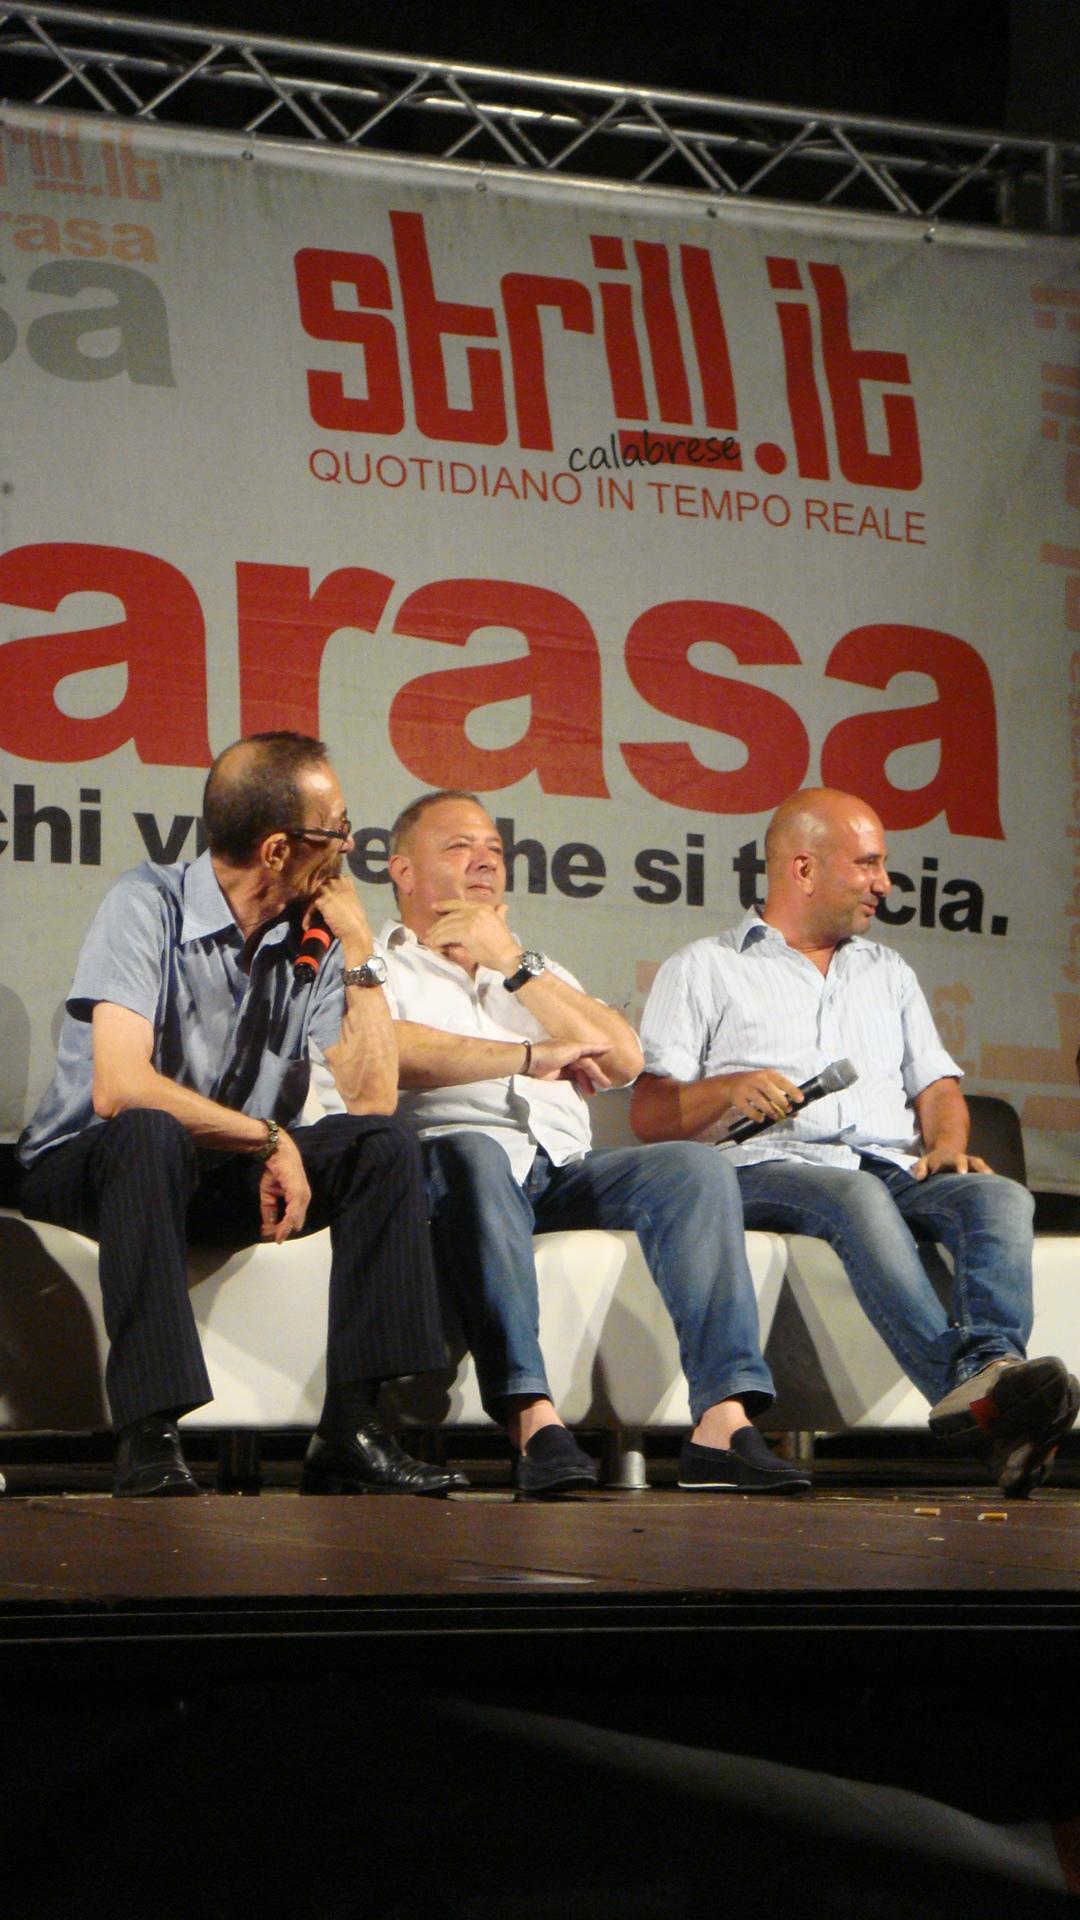 Tabularasa 2015 - Pino Maniaci, Michele Albanese, Alessandro Russo